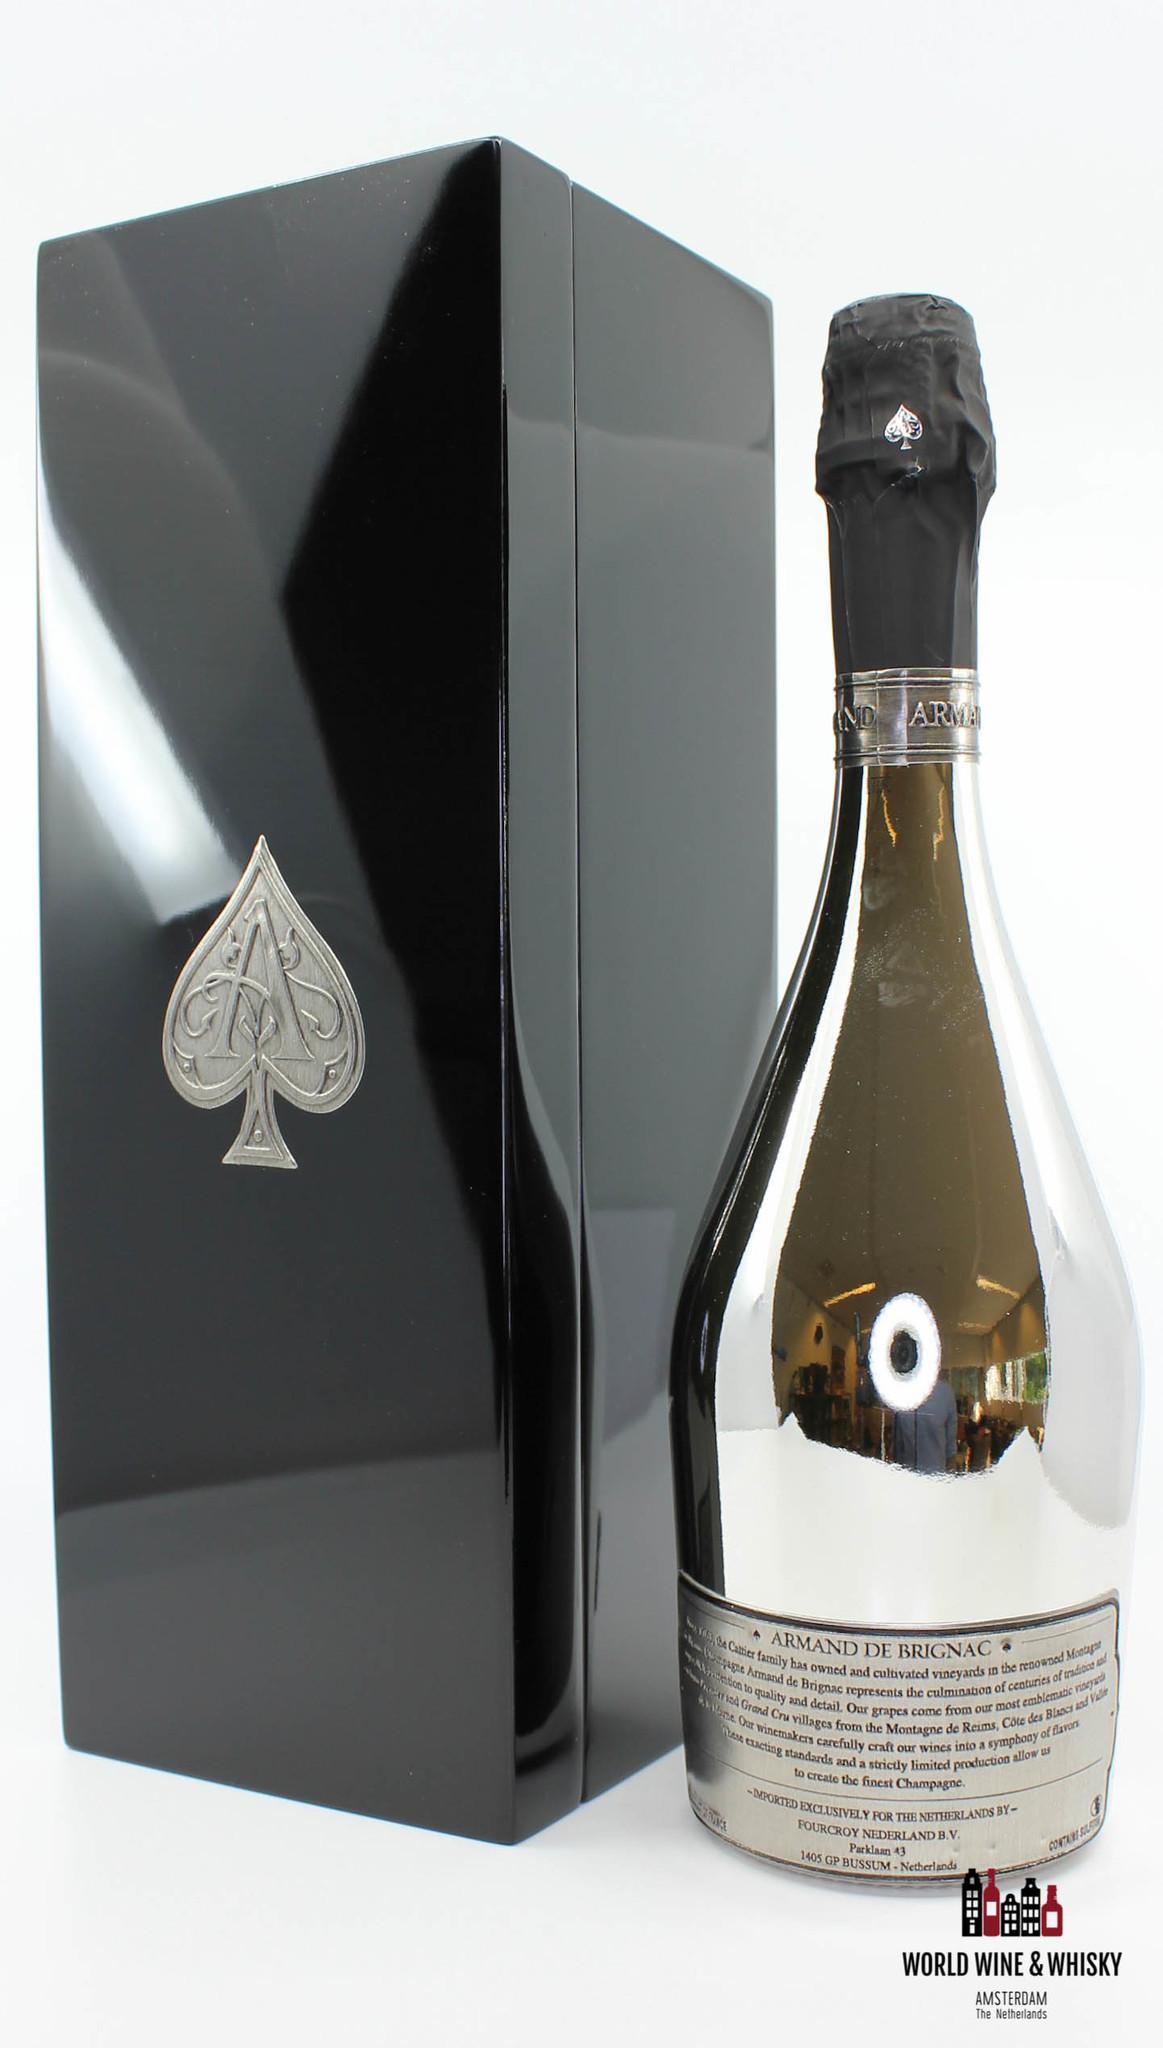 Armand de Brignac Armand de Brignac Blanc de Blancs Champagne Brut 12.5% - in luxury case (750 ml)